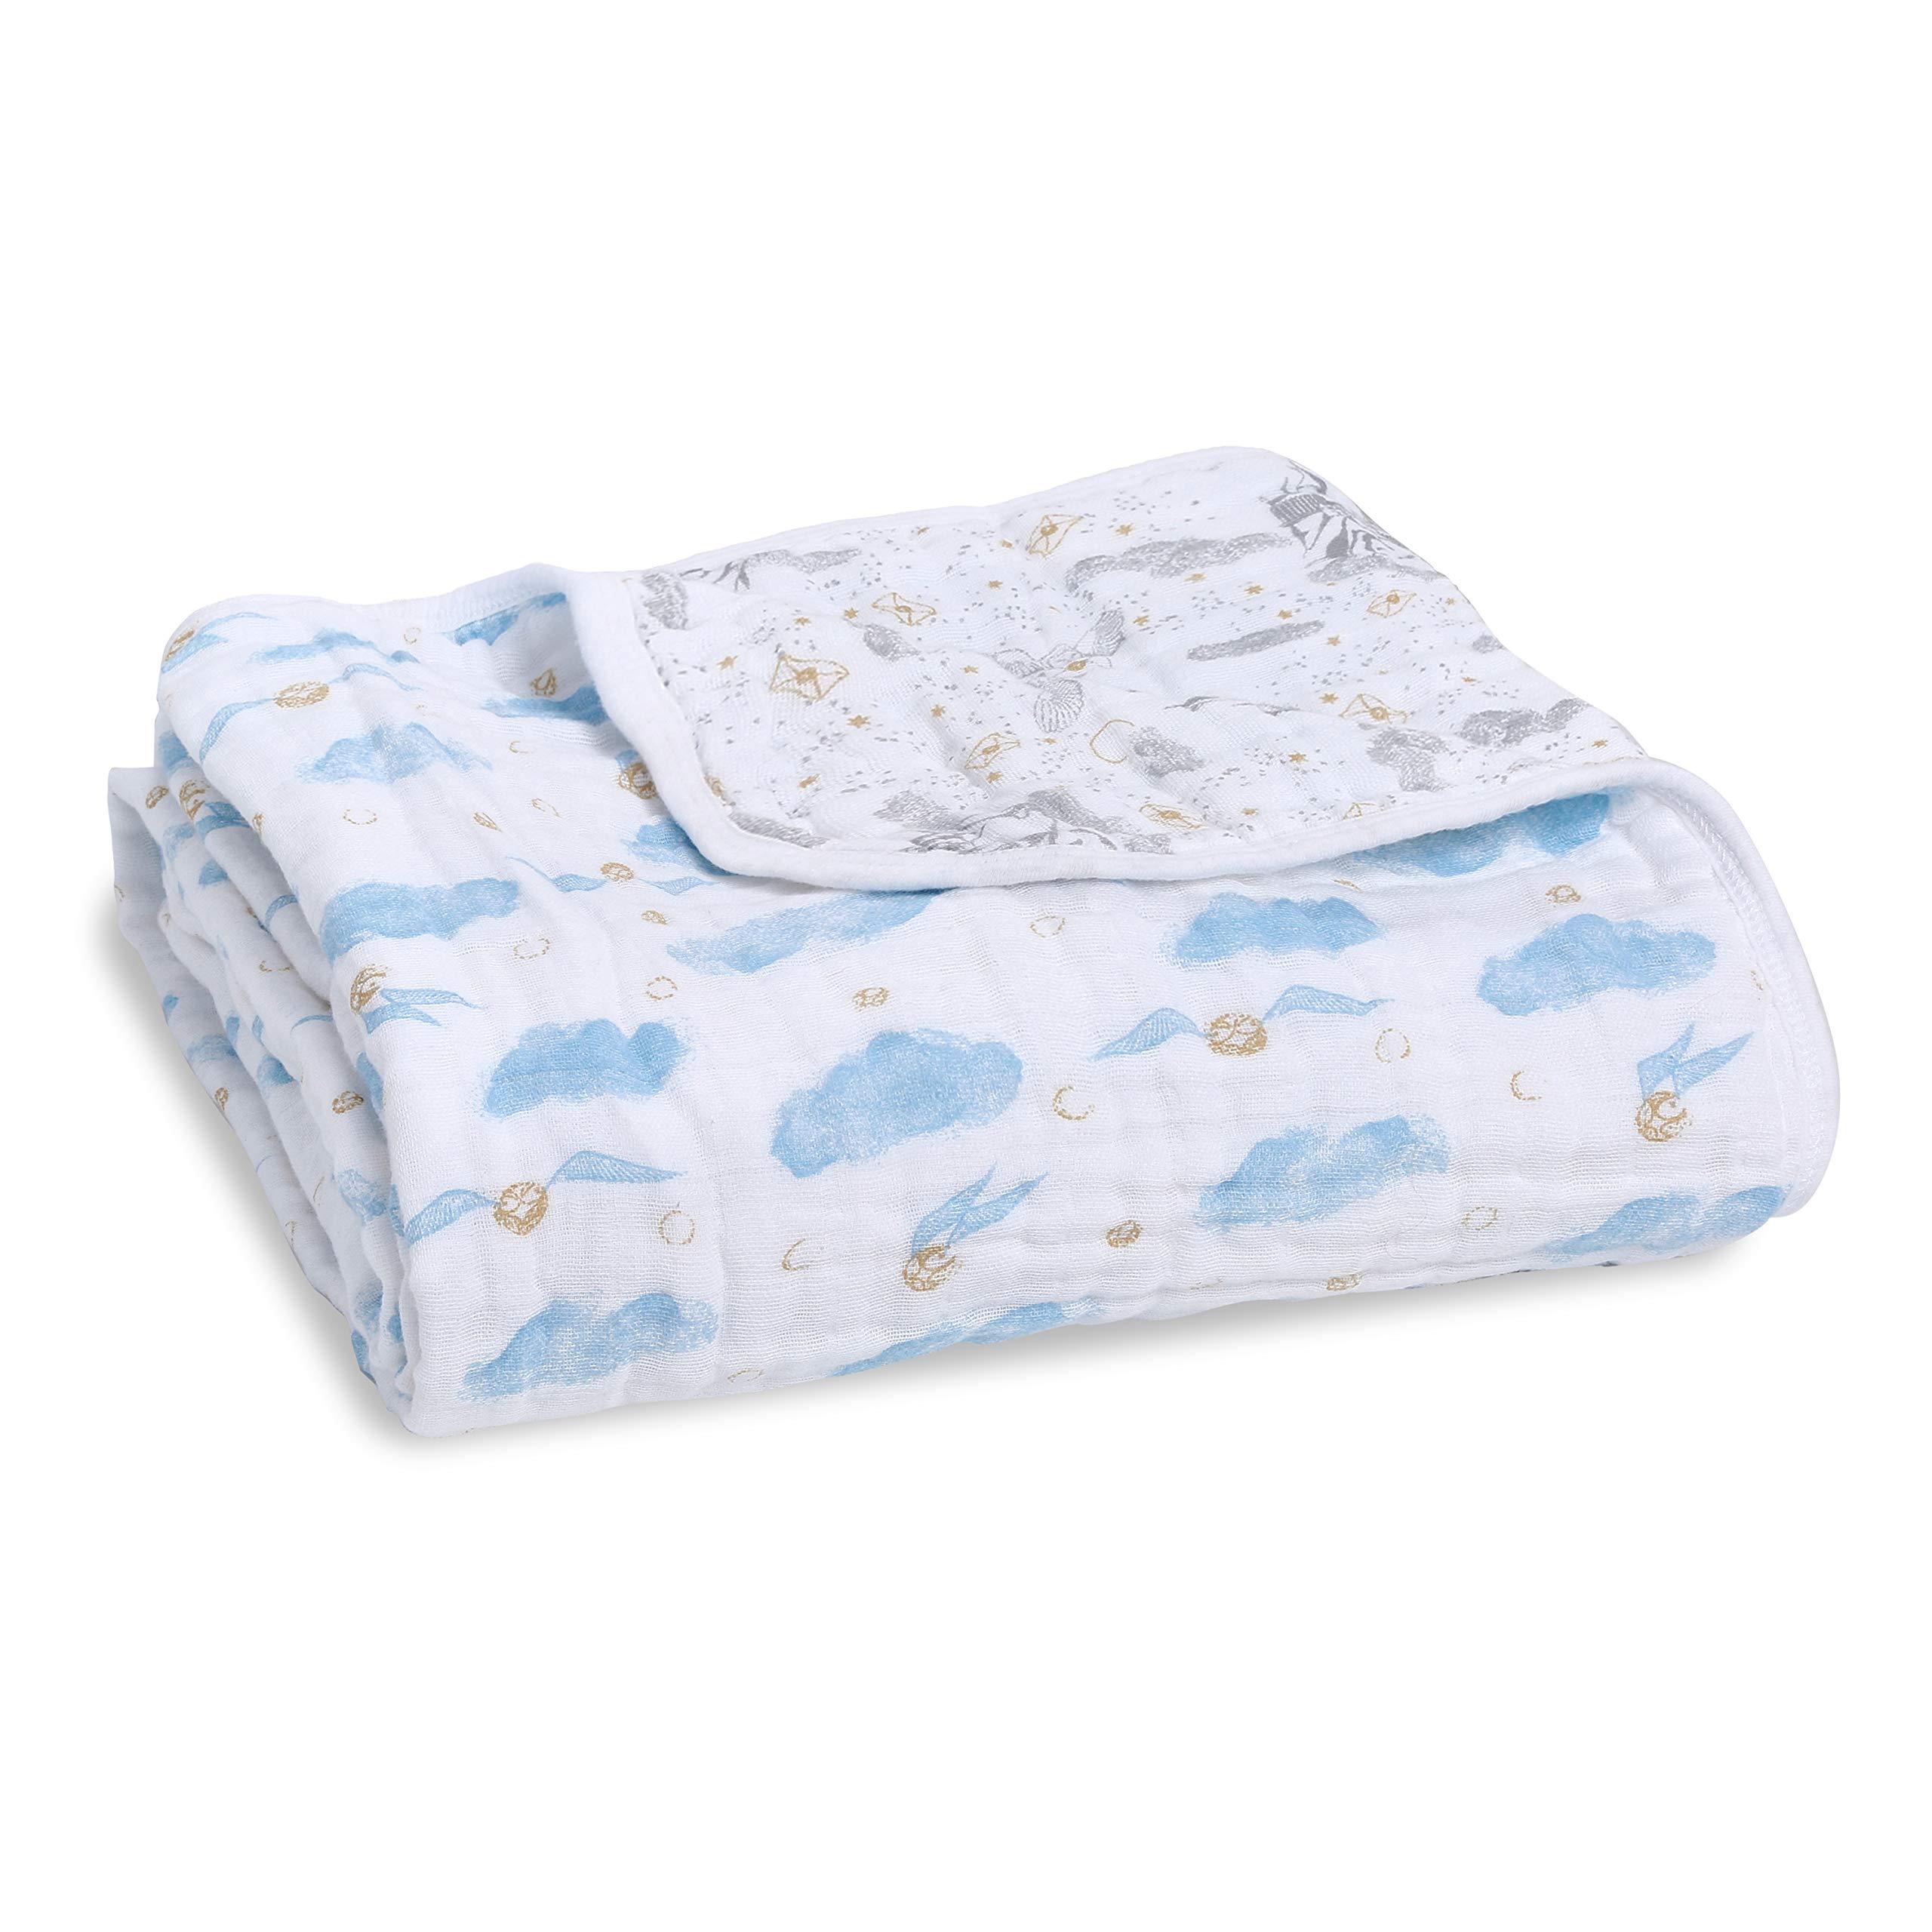 aden + anais Dream Blanket  Boutique Muslin Baby Blankets for Girls & Boys   Ideal Lightweight Newborn Nursery & Crib Blanket, Unisex Toddler Bedding, Shower & Registry Gift, Harry Potter